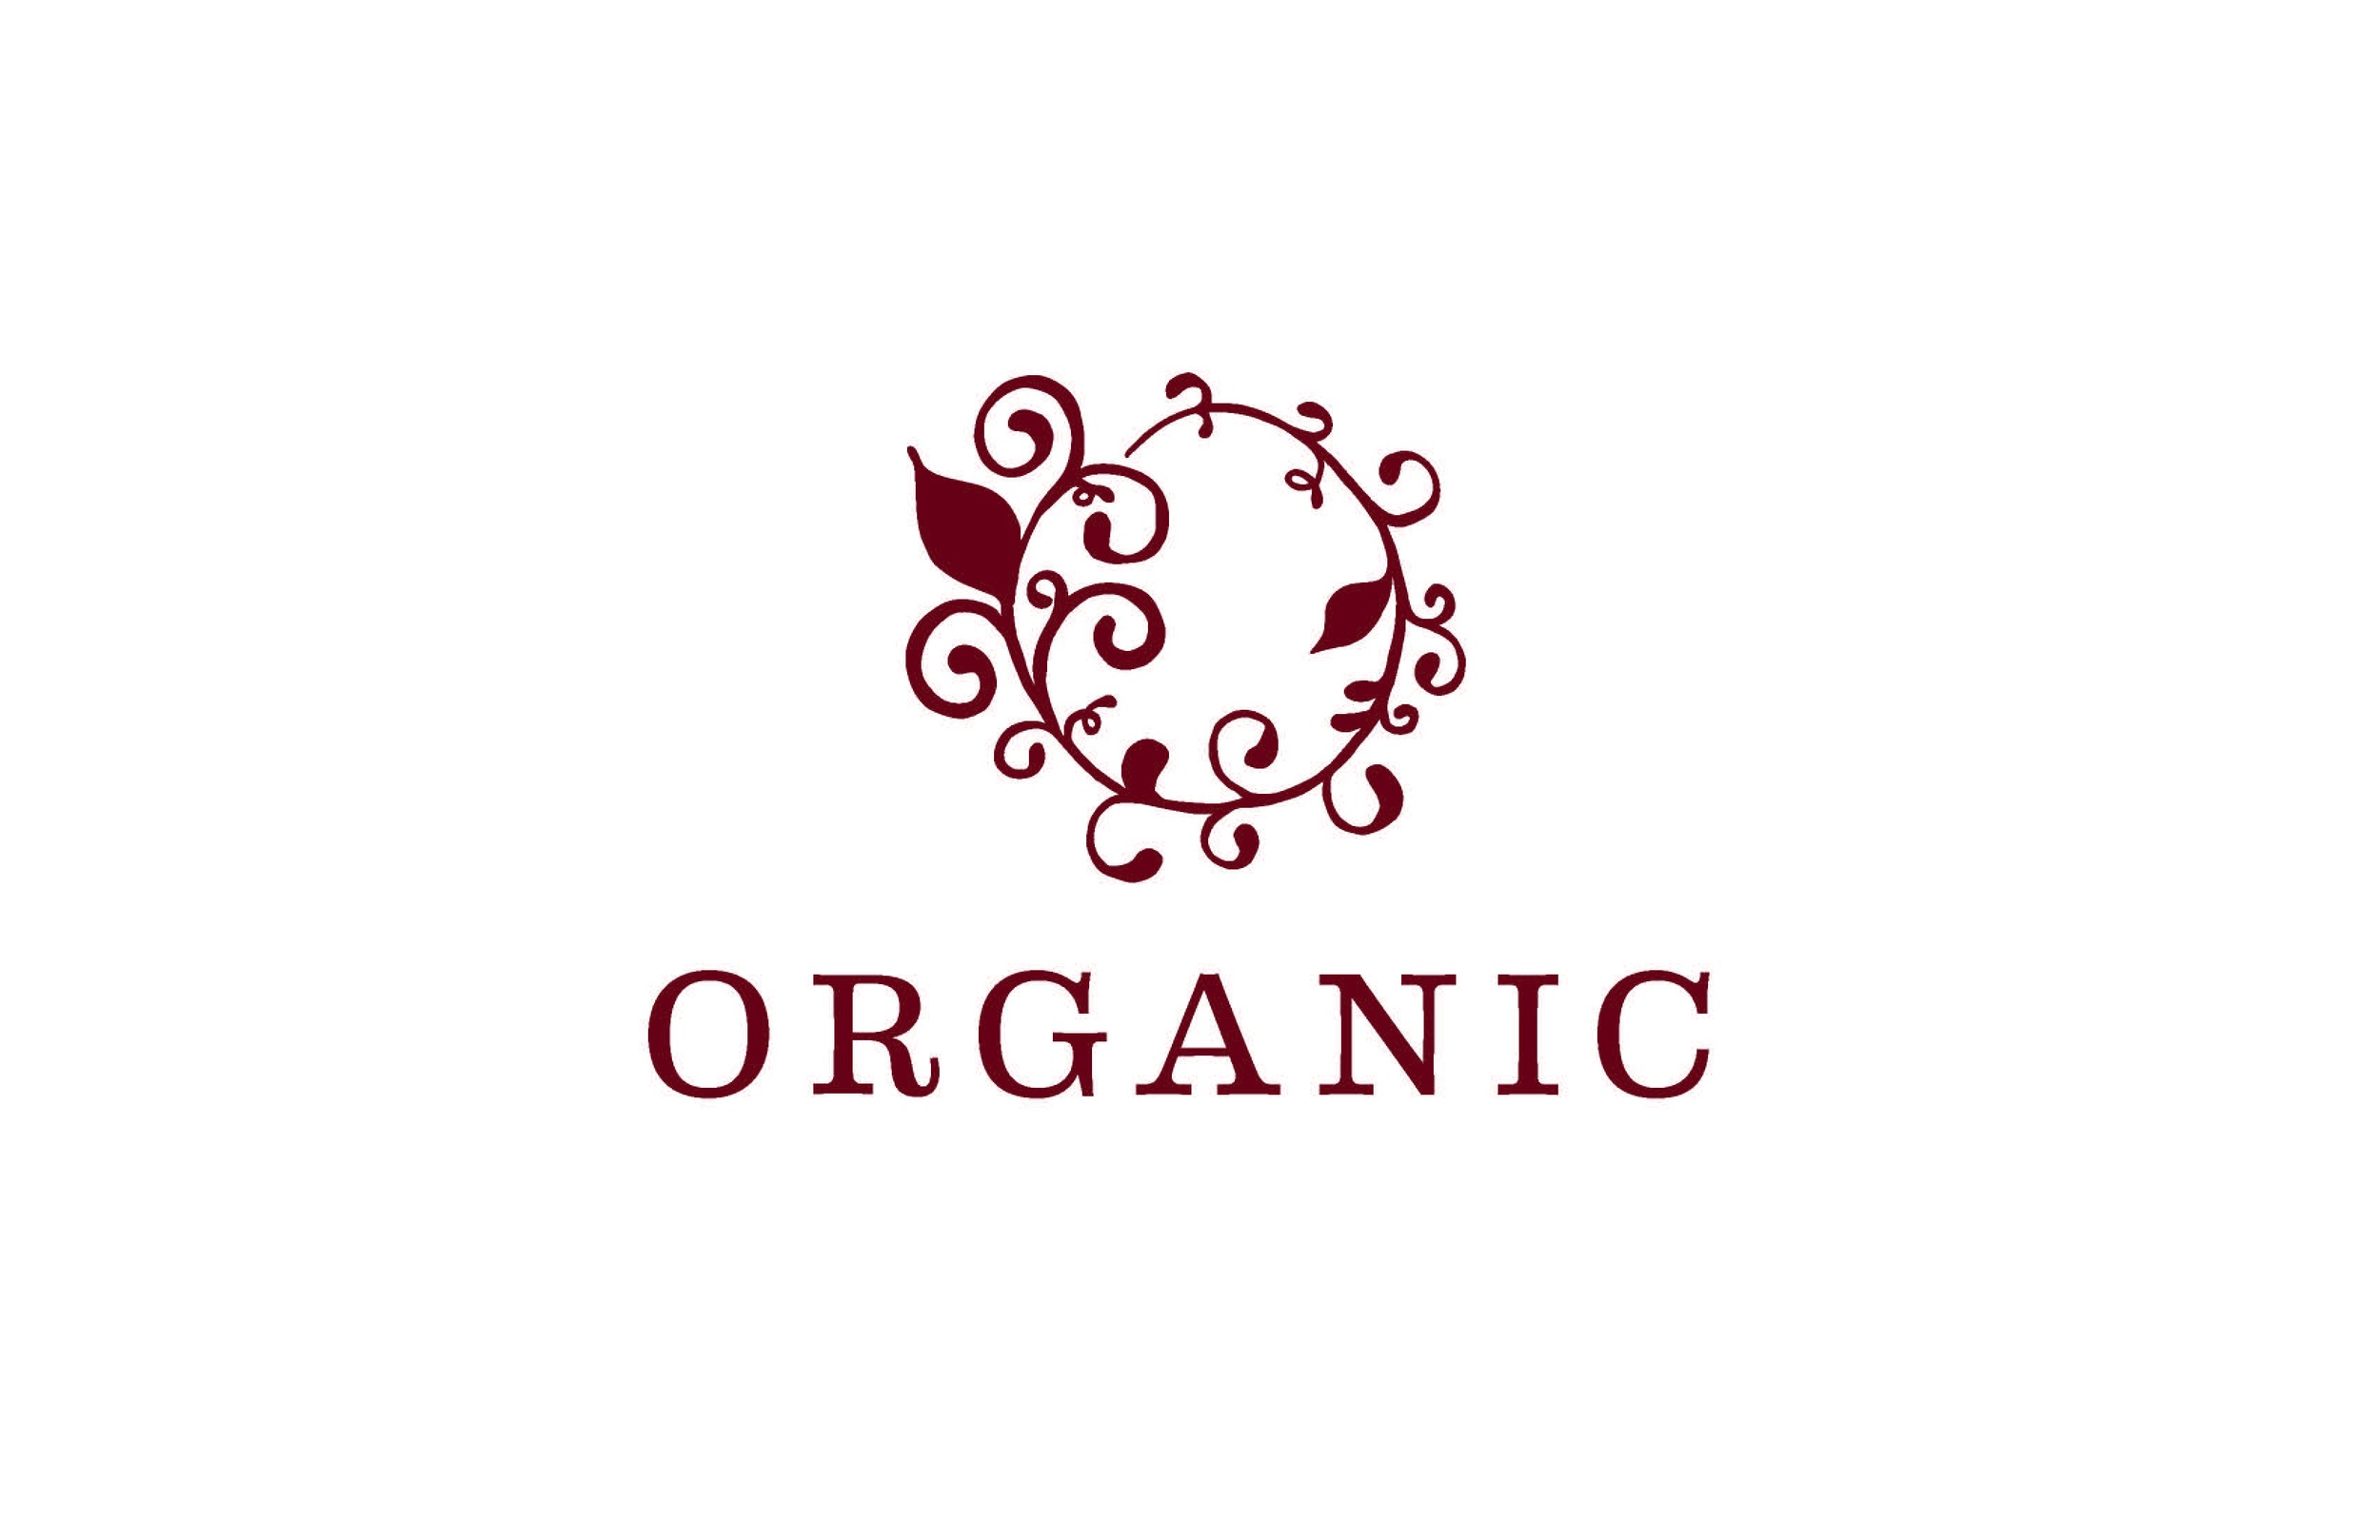 Organic-3.jpg